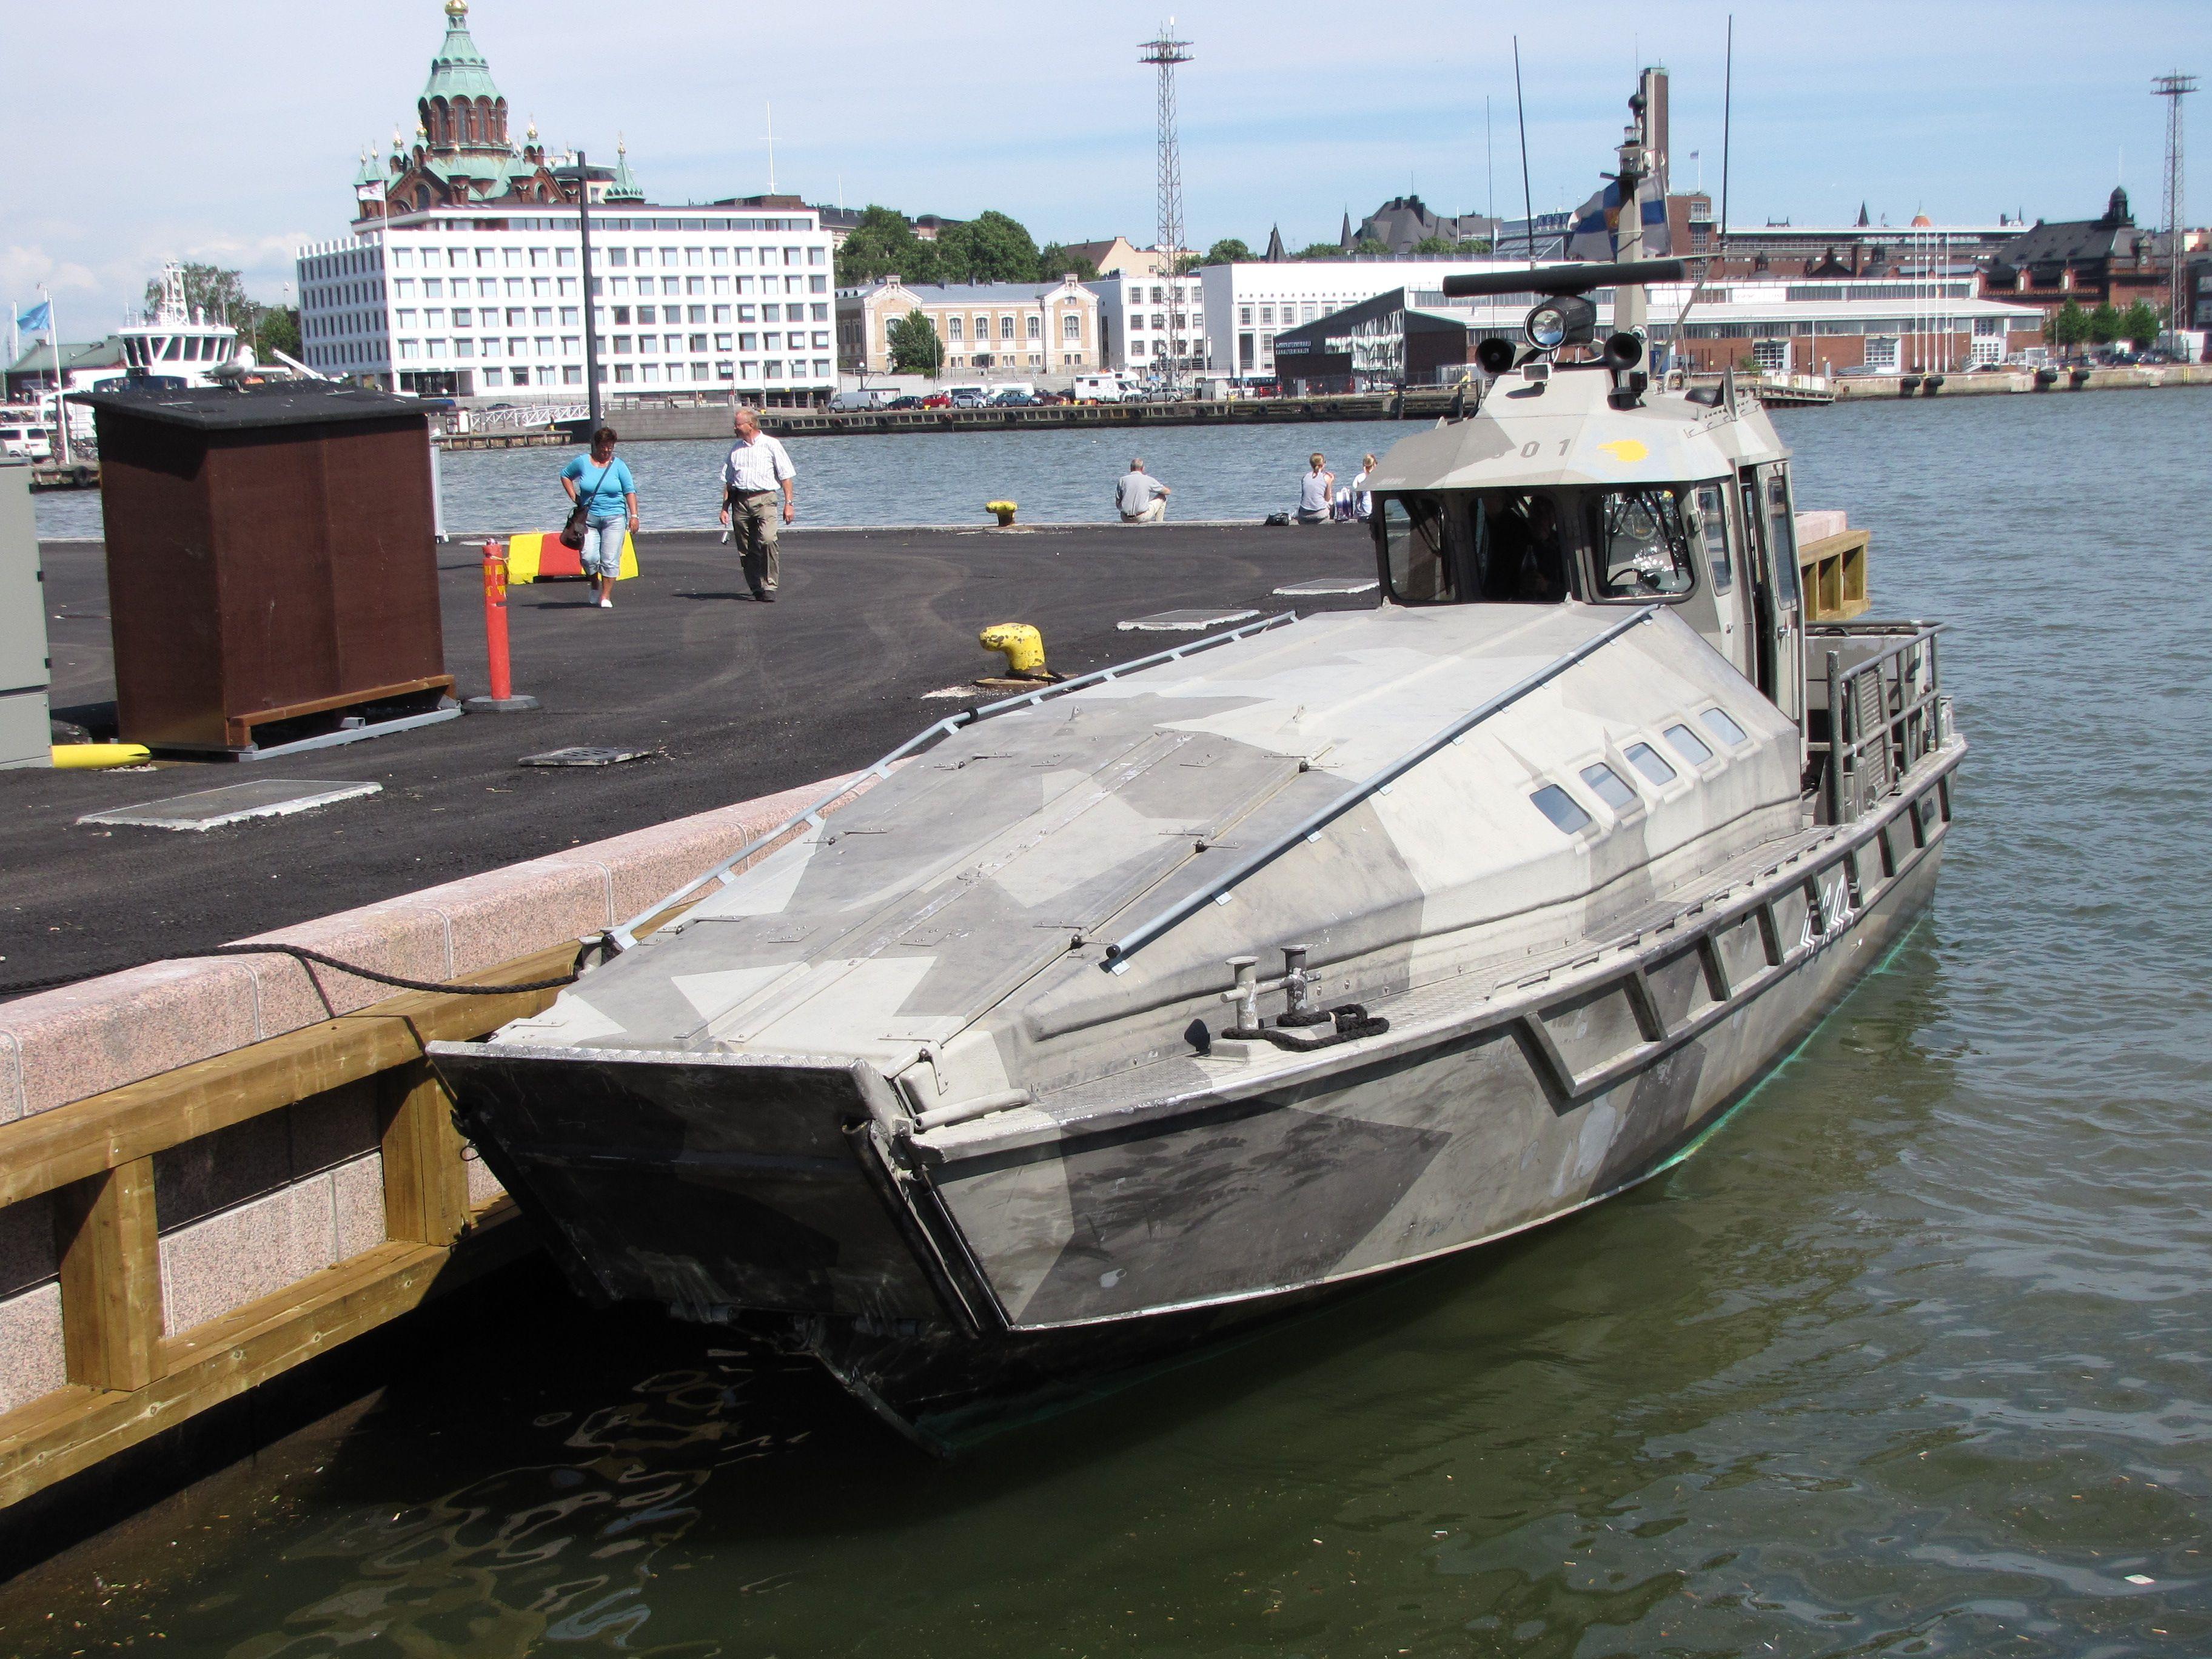 Jurmo landing craft fishing pontoon boats pinterest for Military landing craft for sale